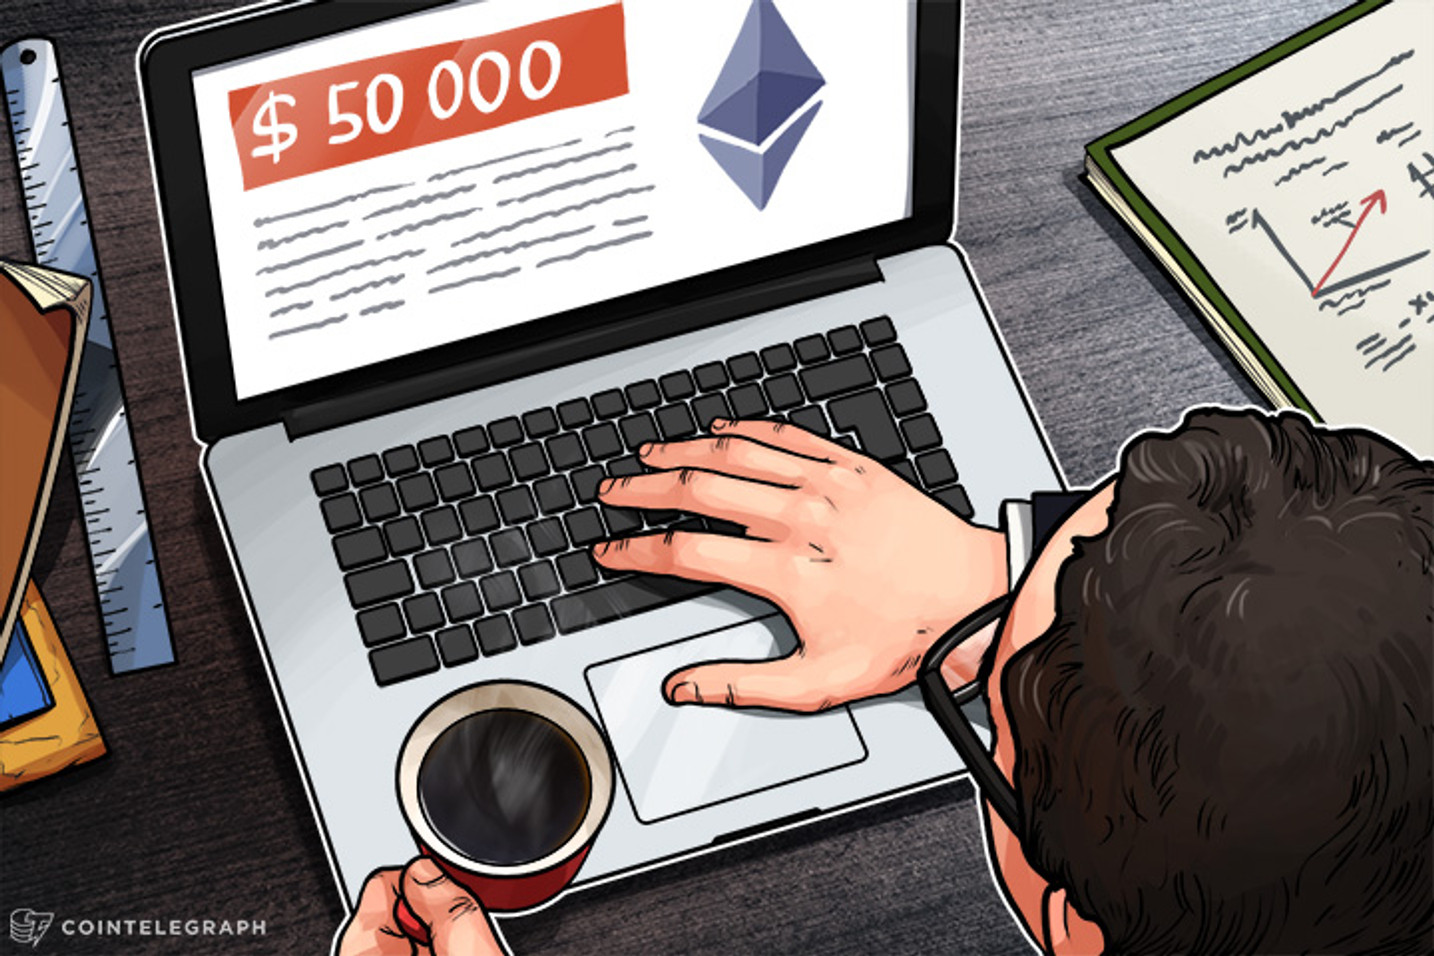 Ethereum Messaging Platform Status Offers $50,000 Bug Bounty